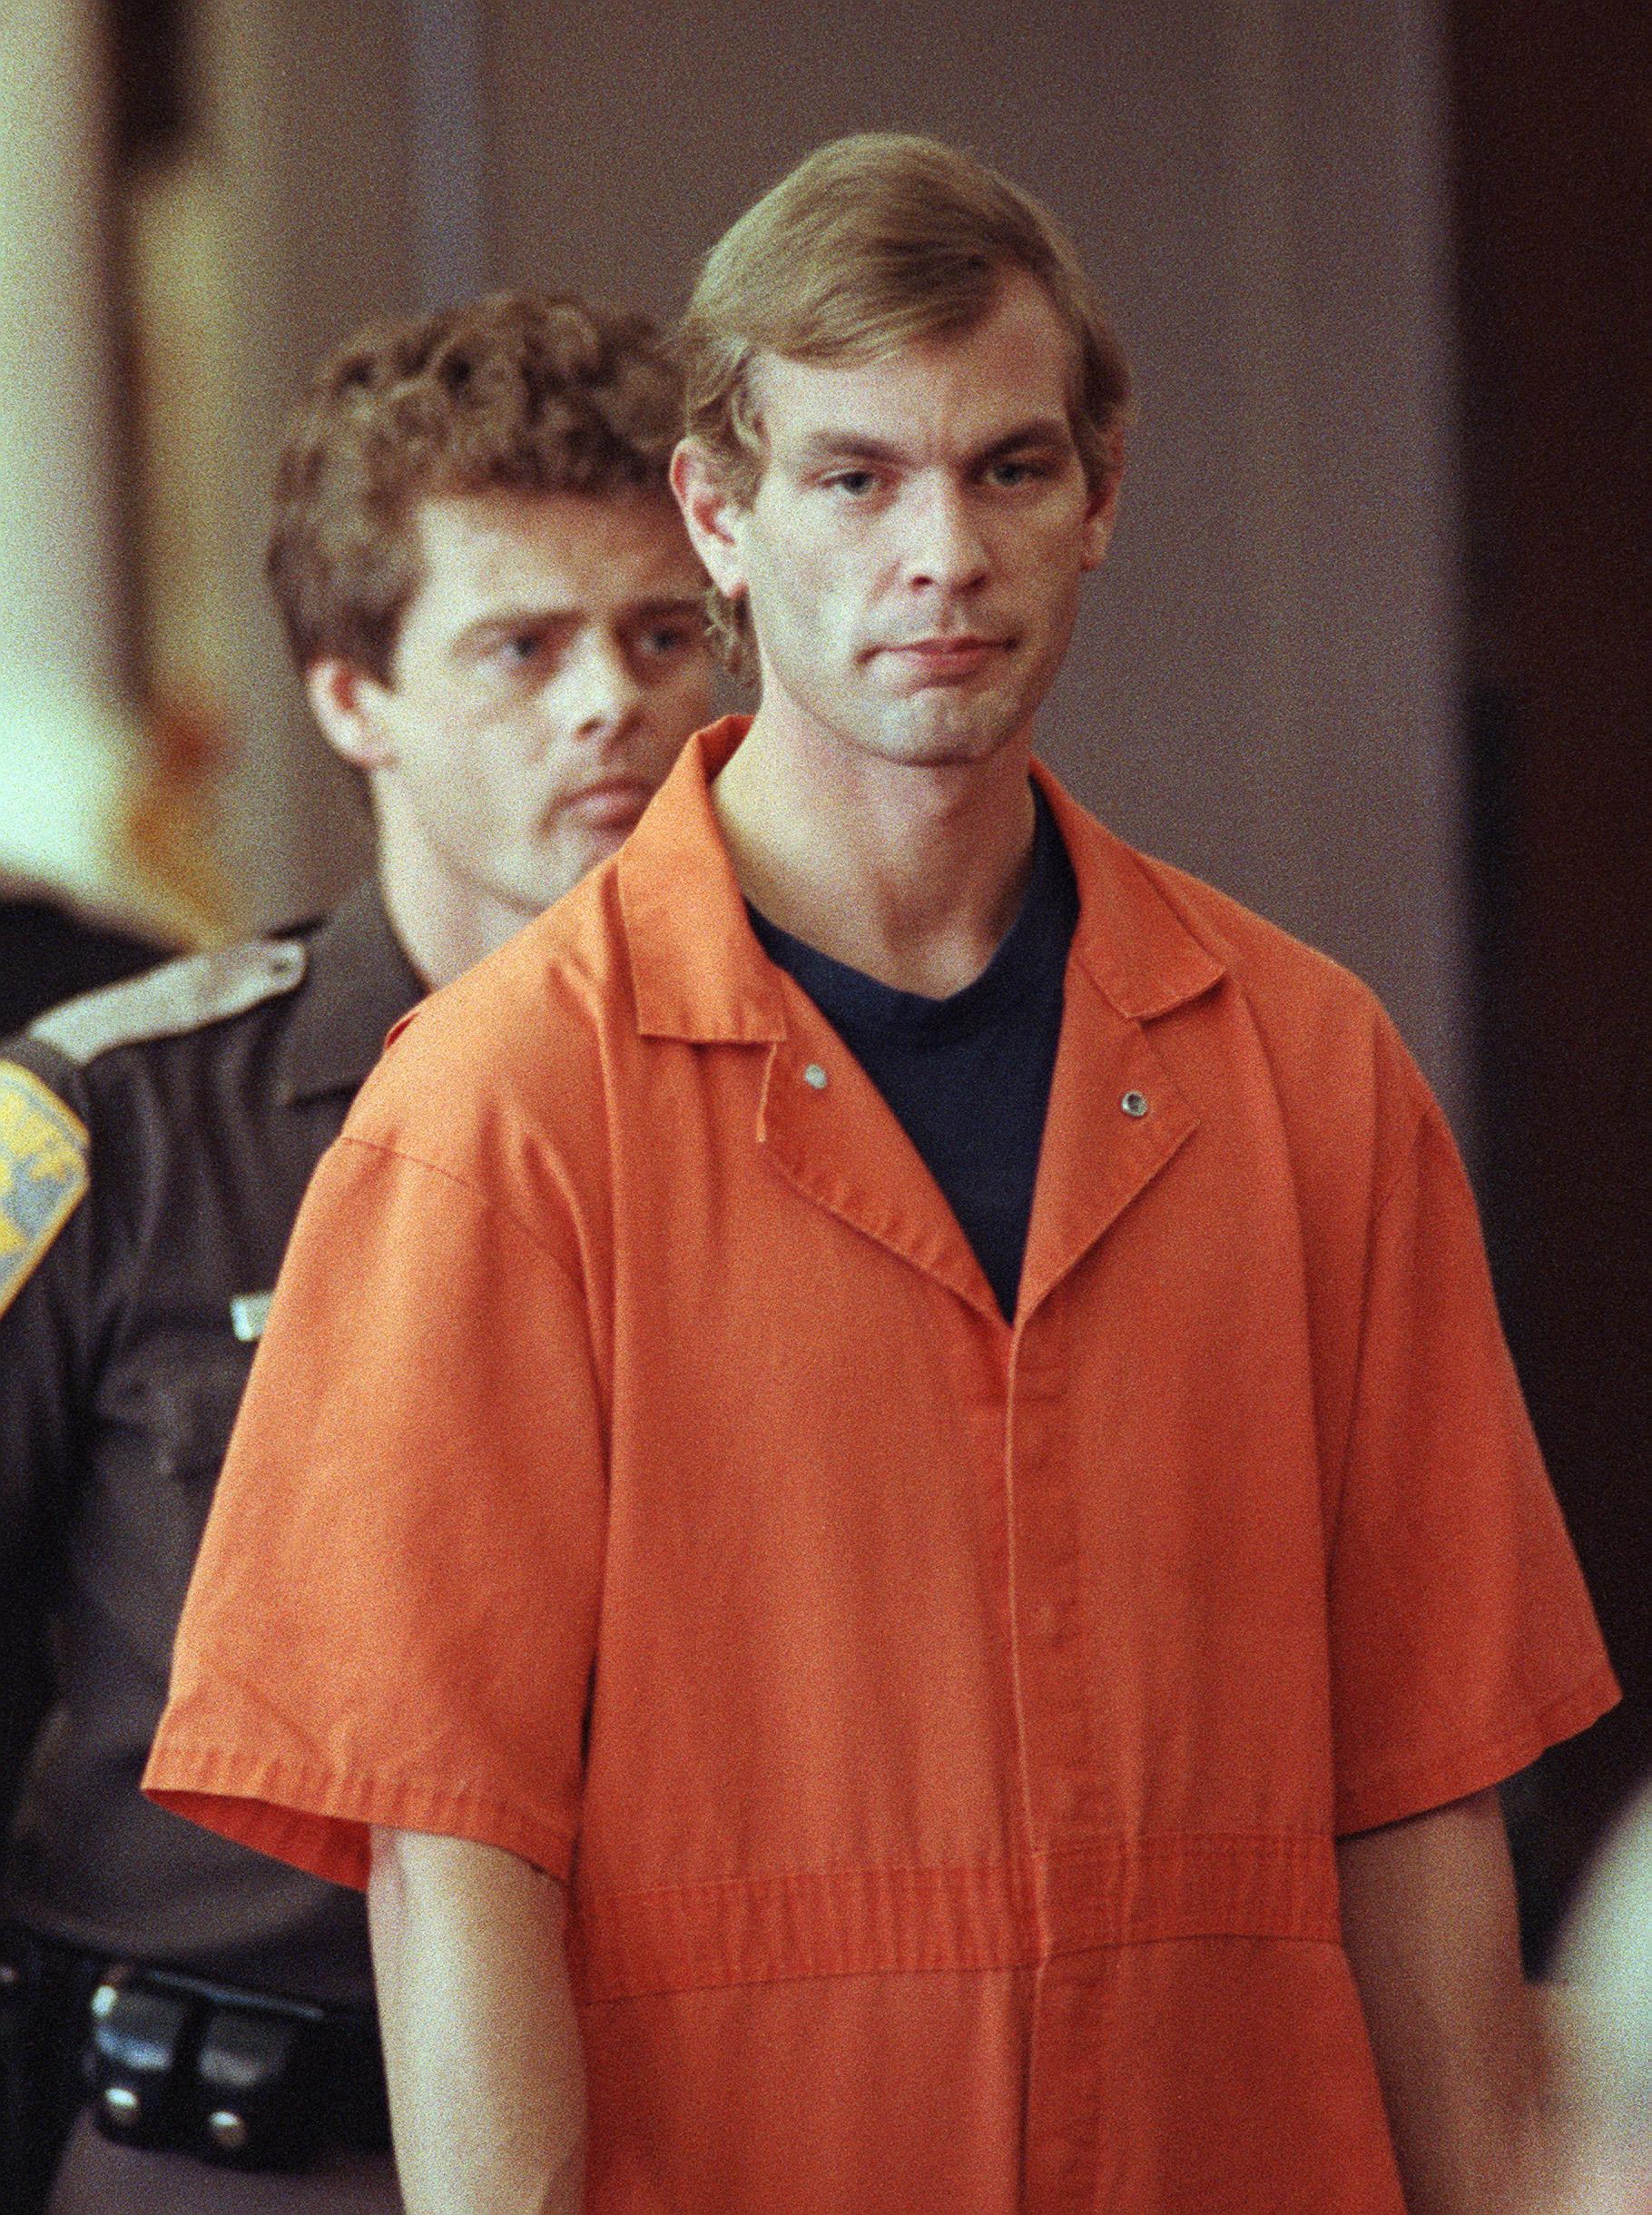 Suspected serial killer Jeffrey L. Dahmer enters the courtroom of judge Jeffrey A. Wagner 06 August 1991.